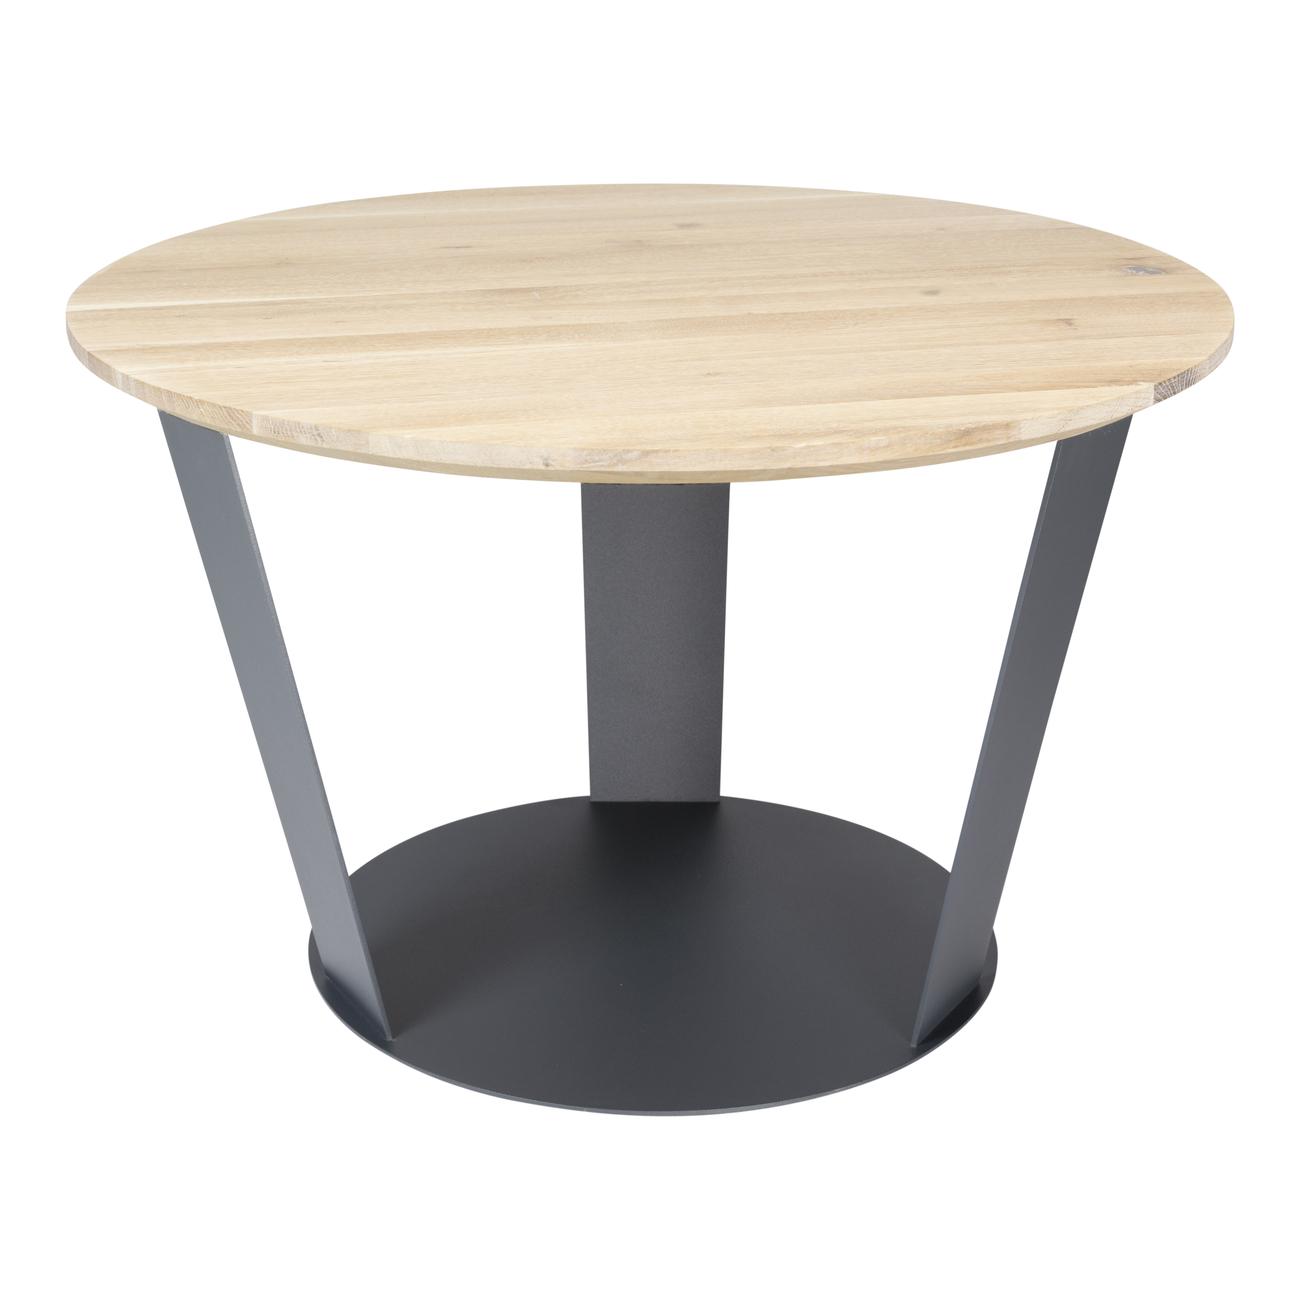 Torna Design Shine bijzettafel ø 58 cm